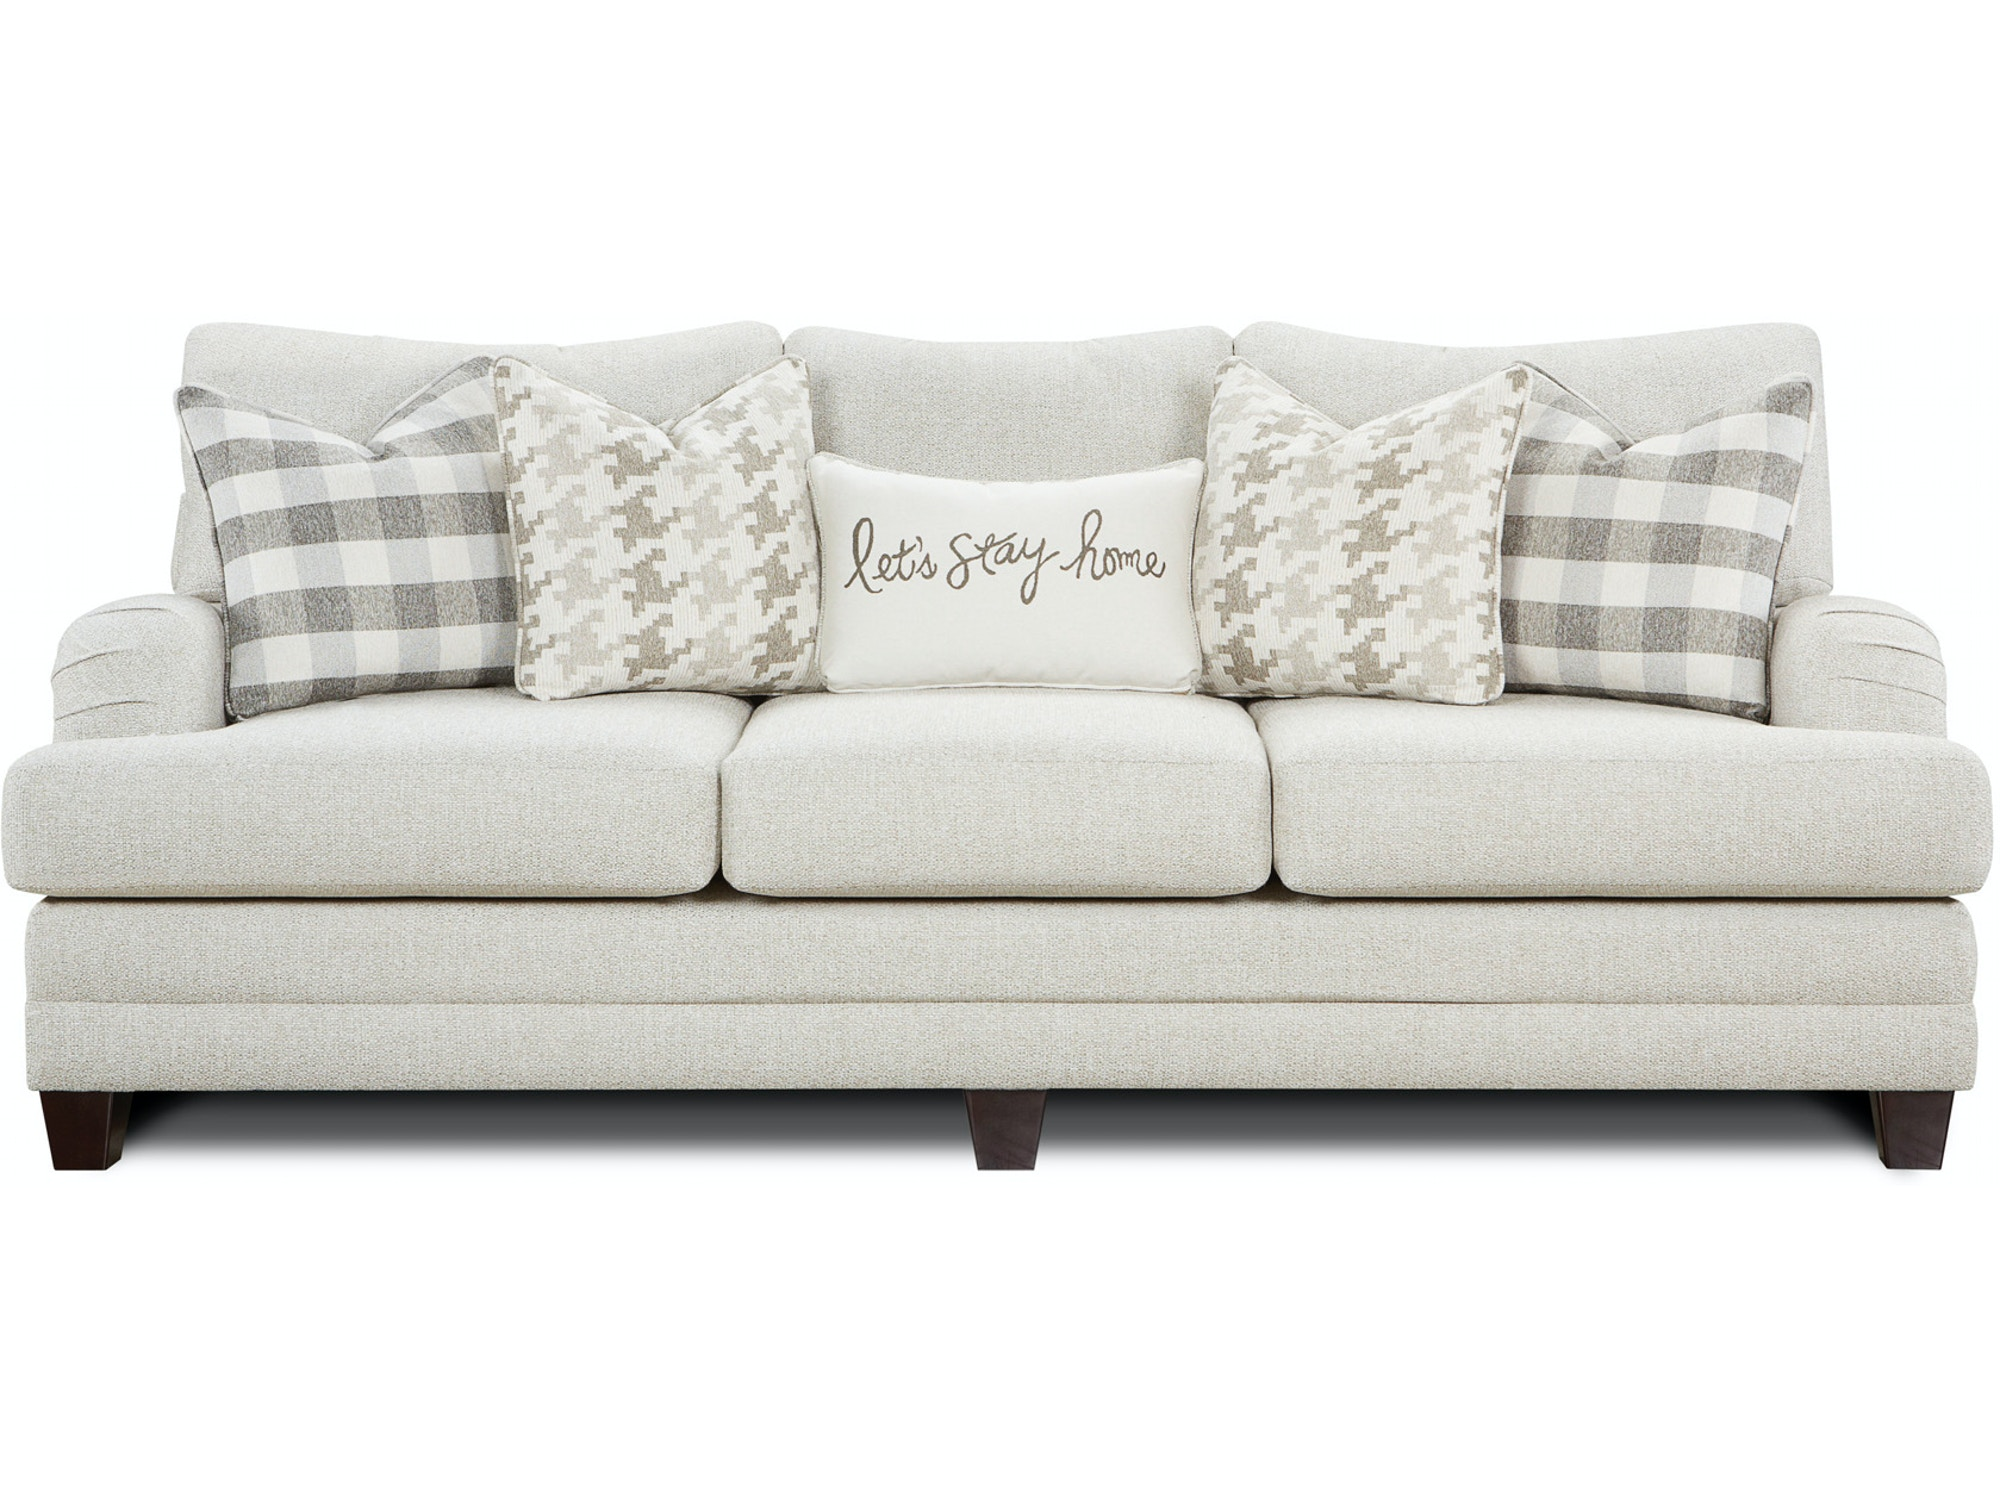 Living Room Sofas - Furniture Fair - Cincinnati & Dayton OH and ...